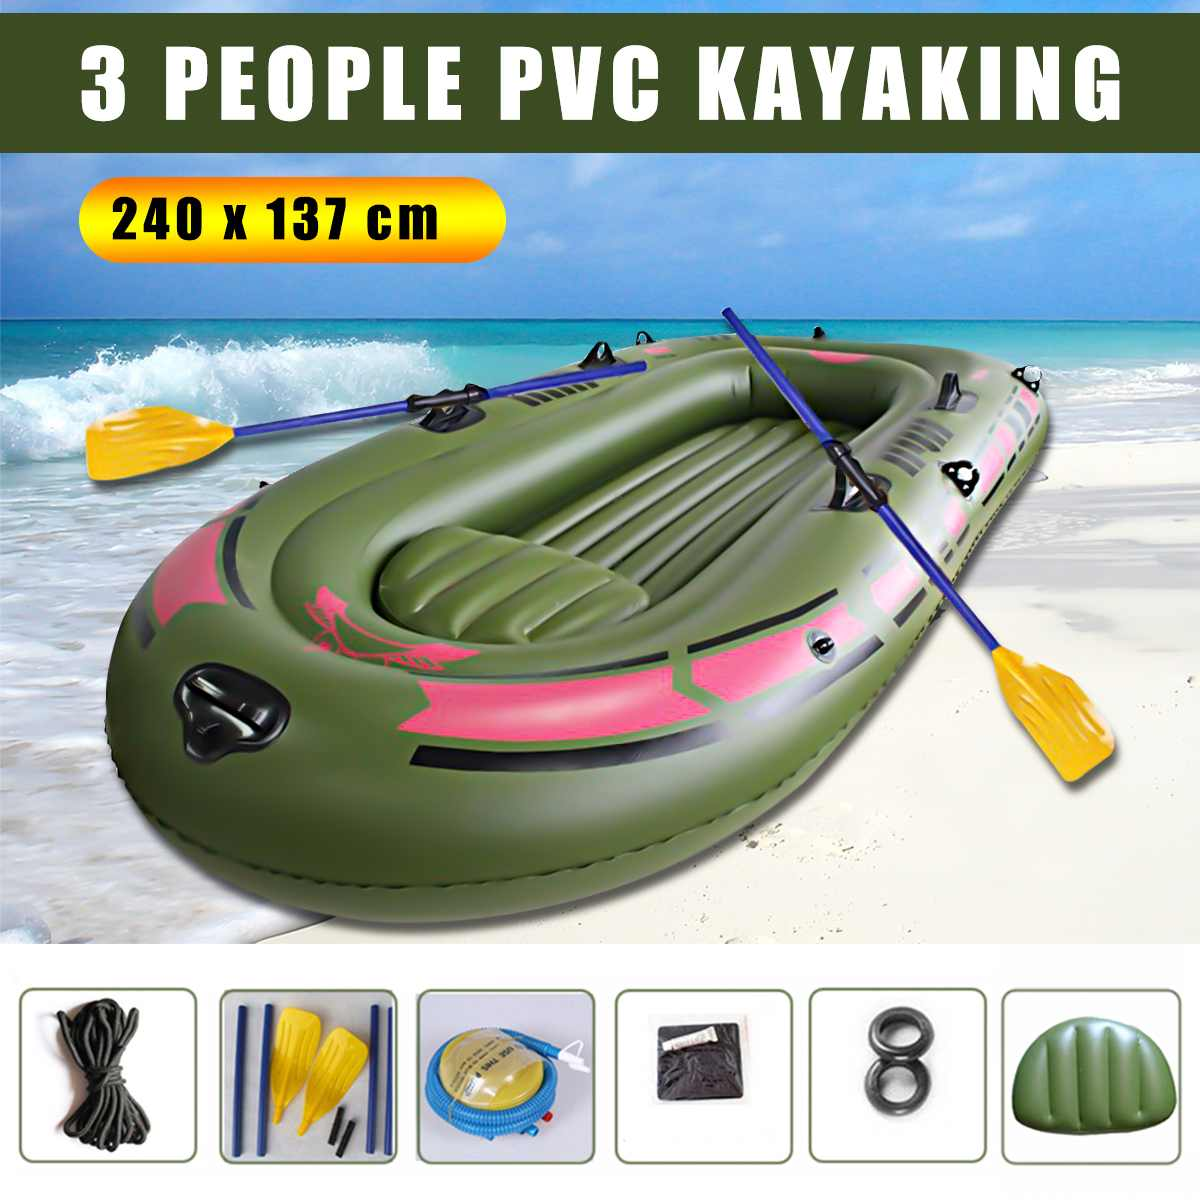 240x137cm 3 Person Inflatable Rowing Boat Bearing 100kg Durable PVC Rubber Fishing Kayak Boat Set Drifting Sailboat Surfing Ship